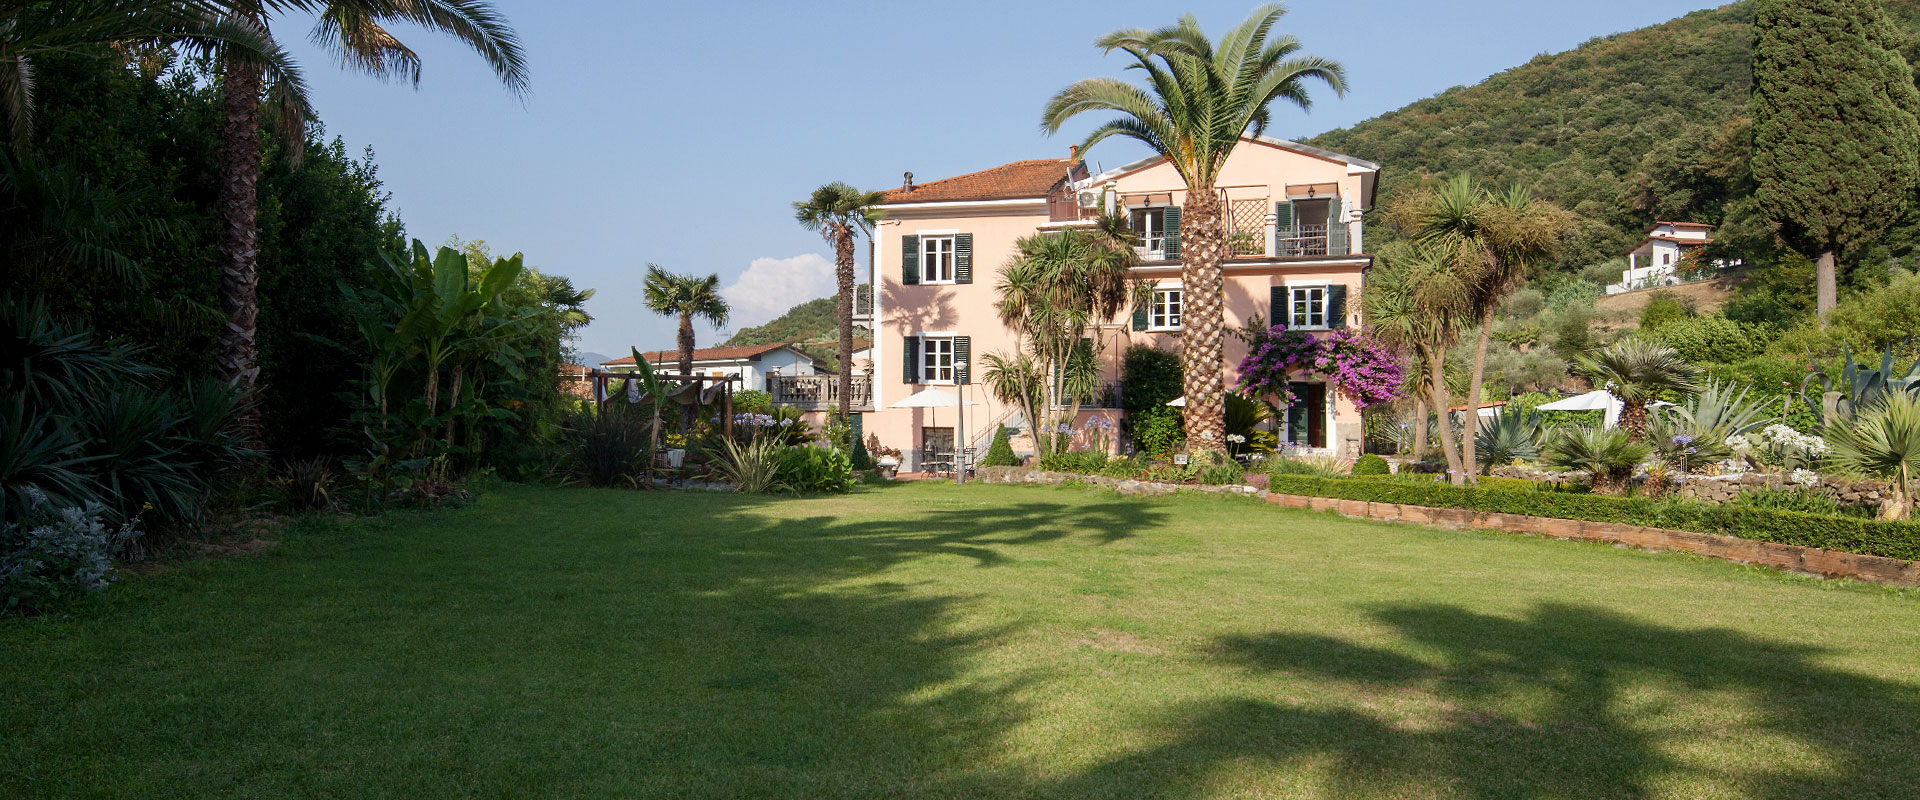 La Musa Resort